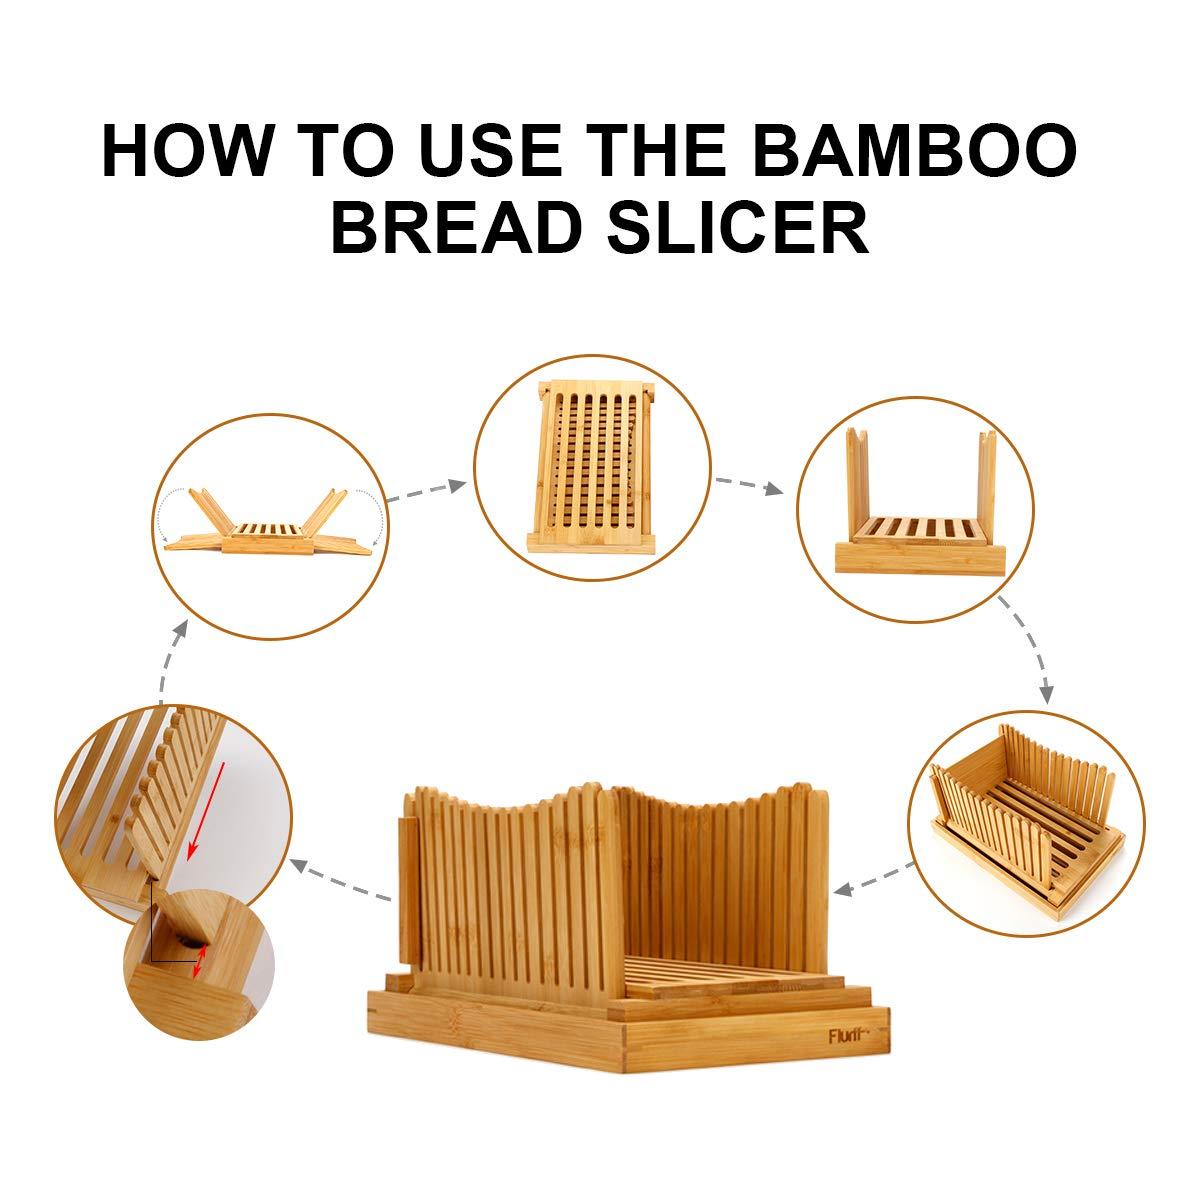 Flurff Bamboo Bread Slicers for Homemade Bread, Compact Foldable Bread Slicer Guide, Wooden Bagel Slicer